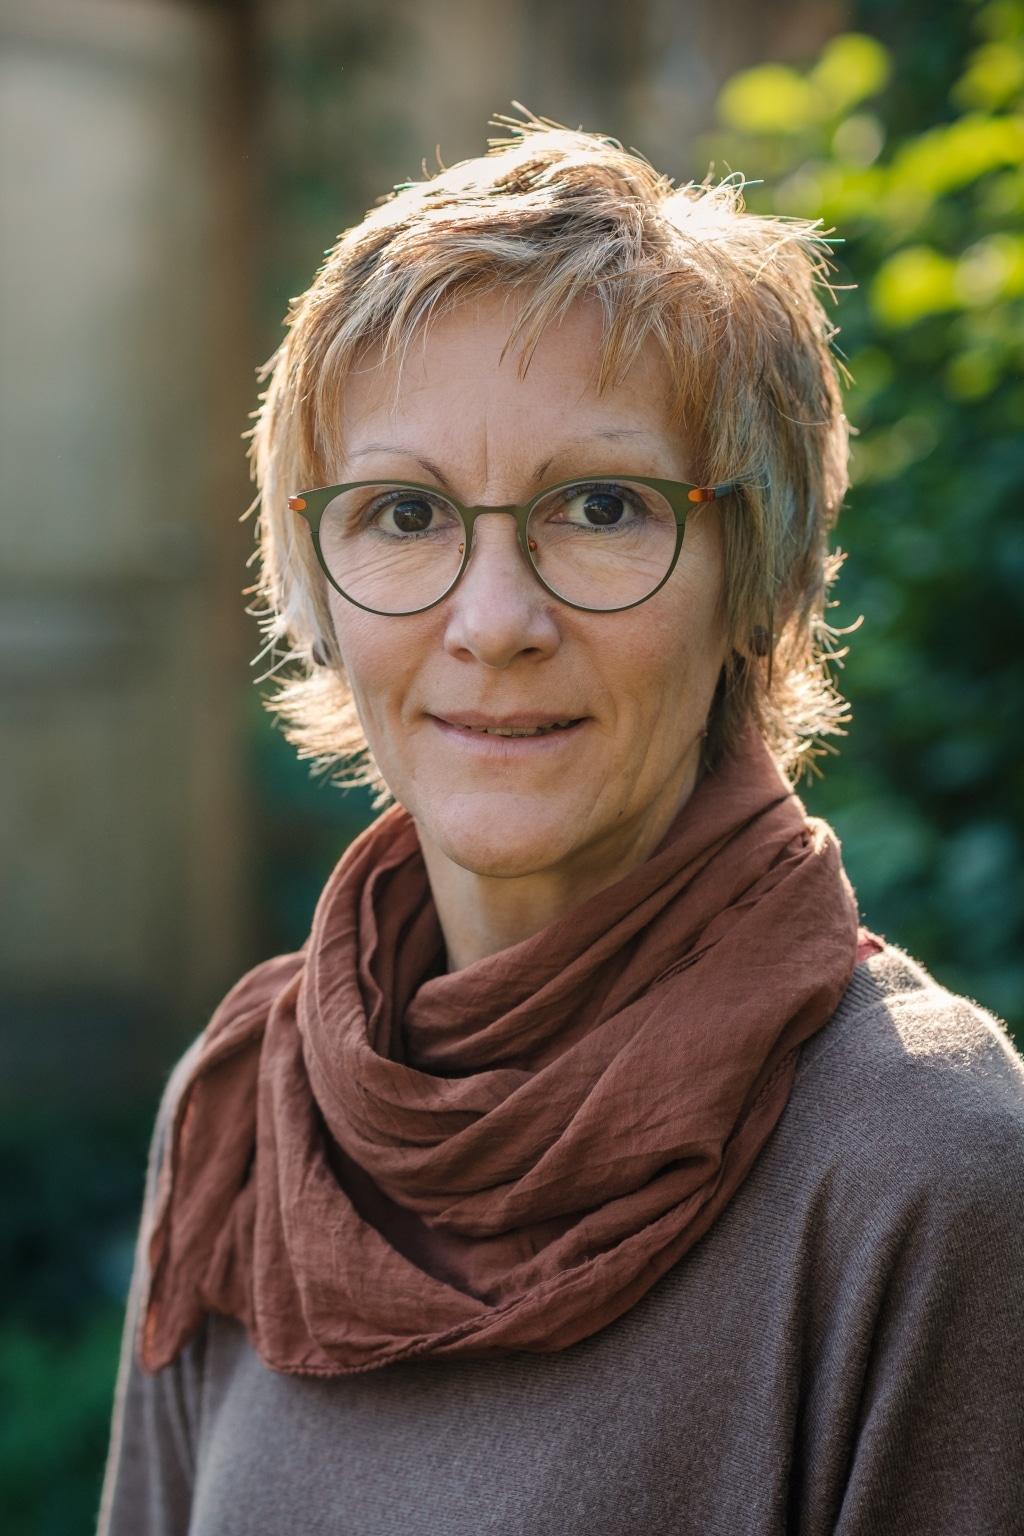 Andrea Freund-Krammer